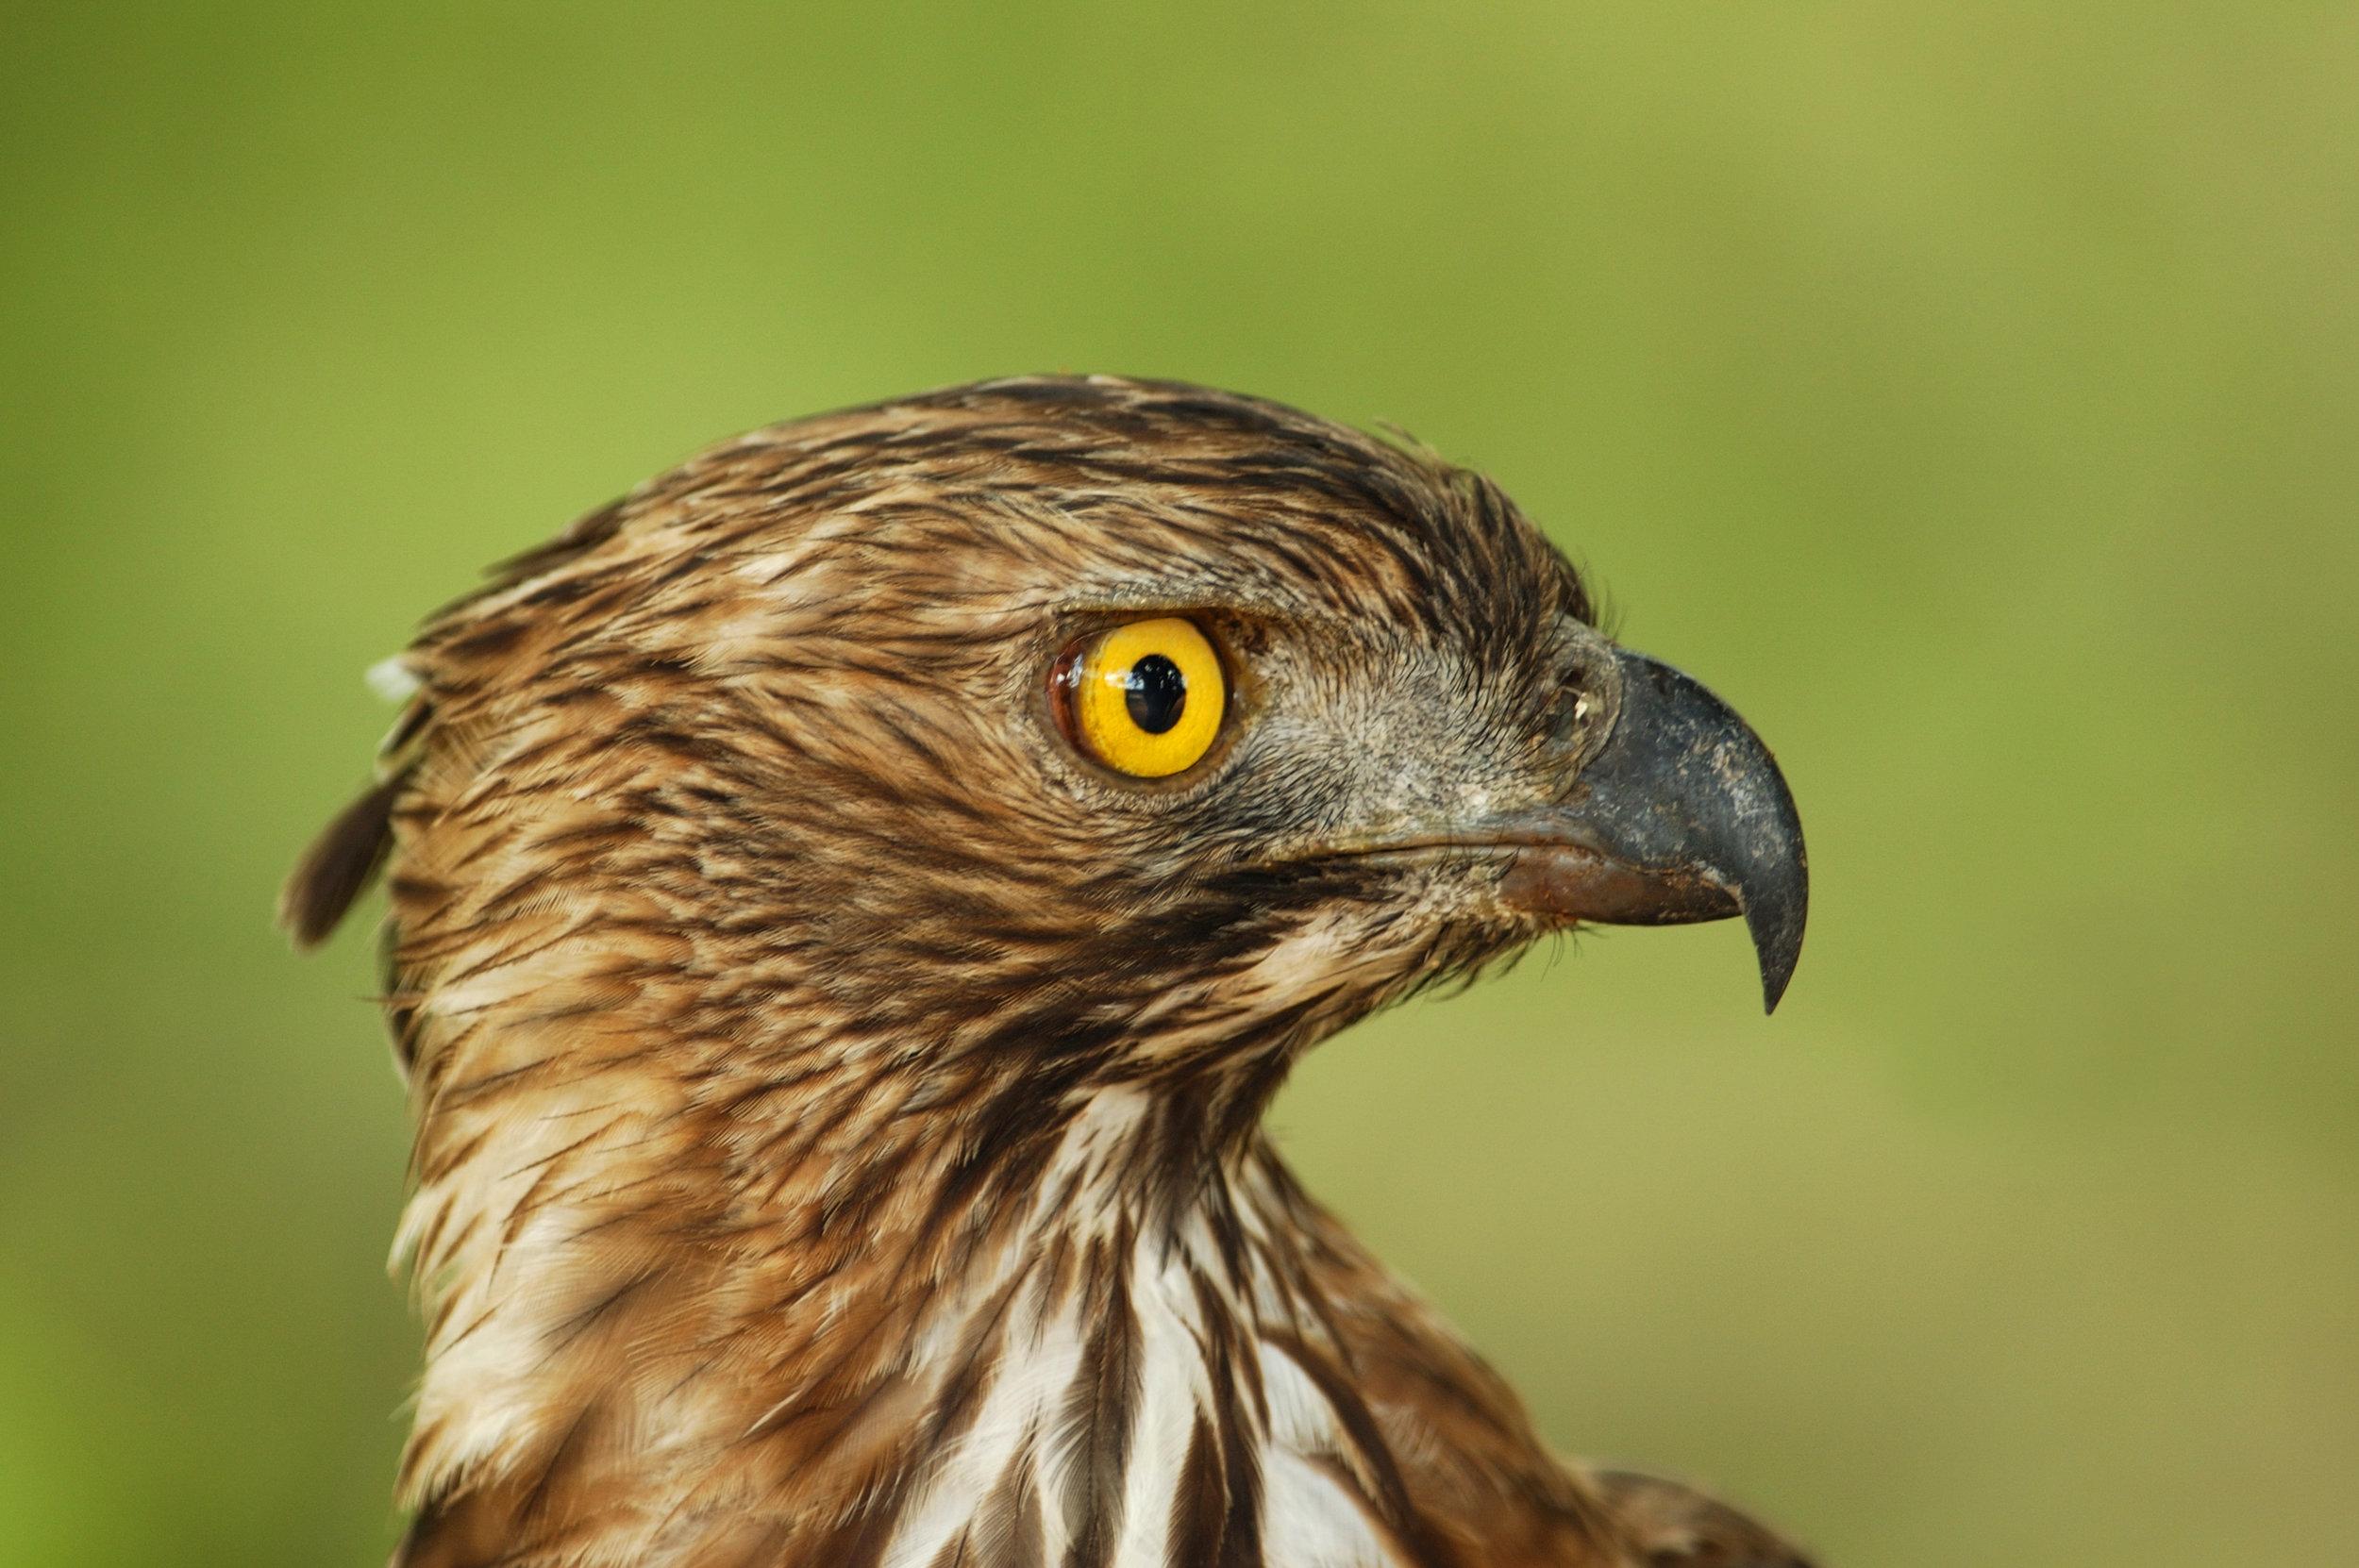 invite-to-paradise-sri-lanka-honeymoon-holiday-wildlife-safari-eagle.jpg